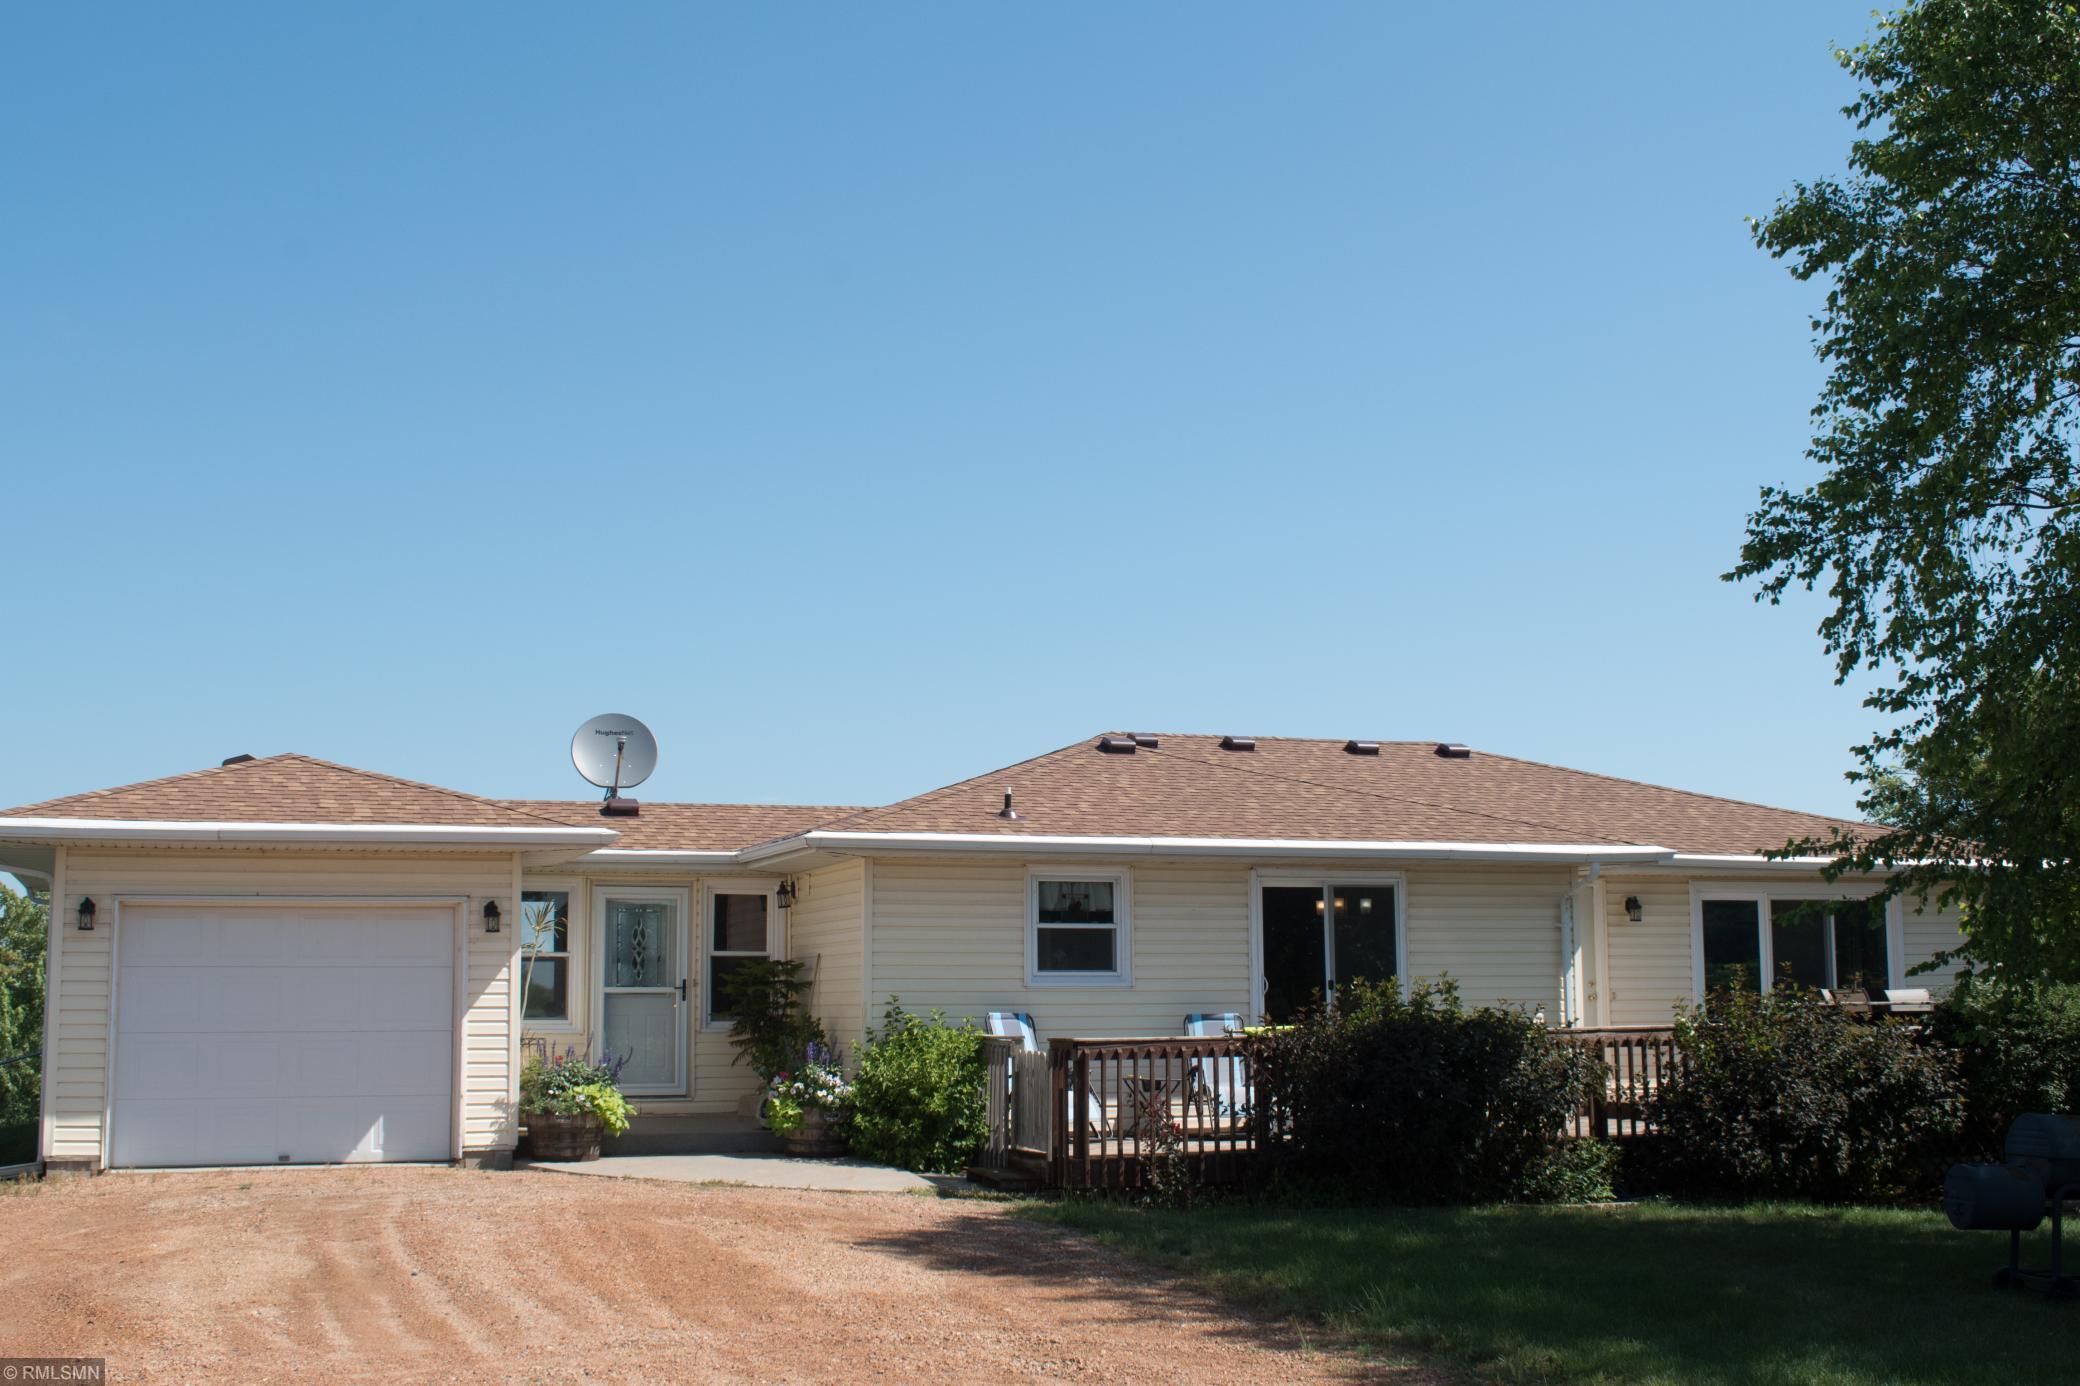 6430 160th Property Photo - Glencoe, MN real estate listing